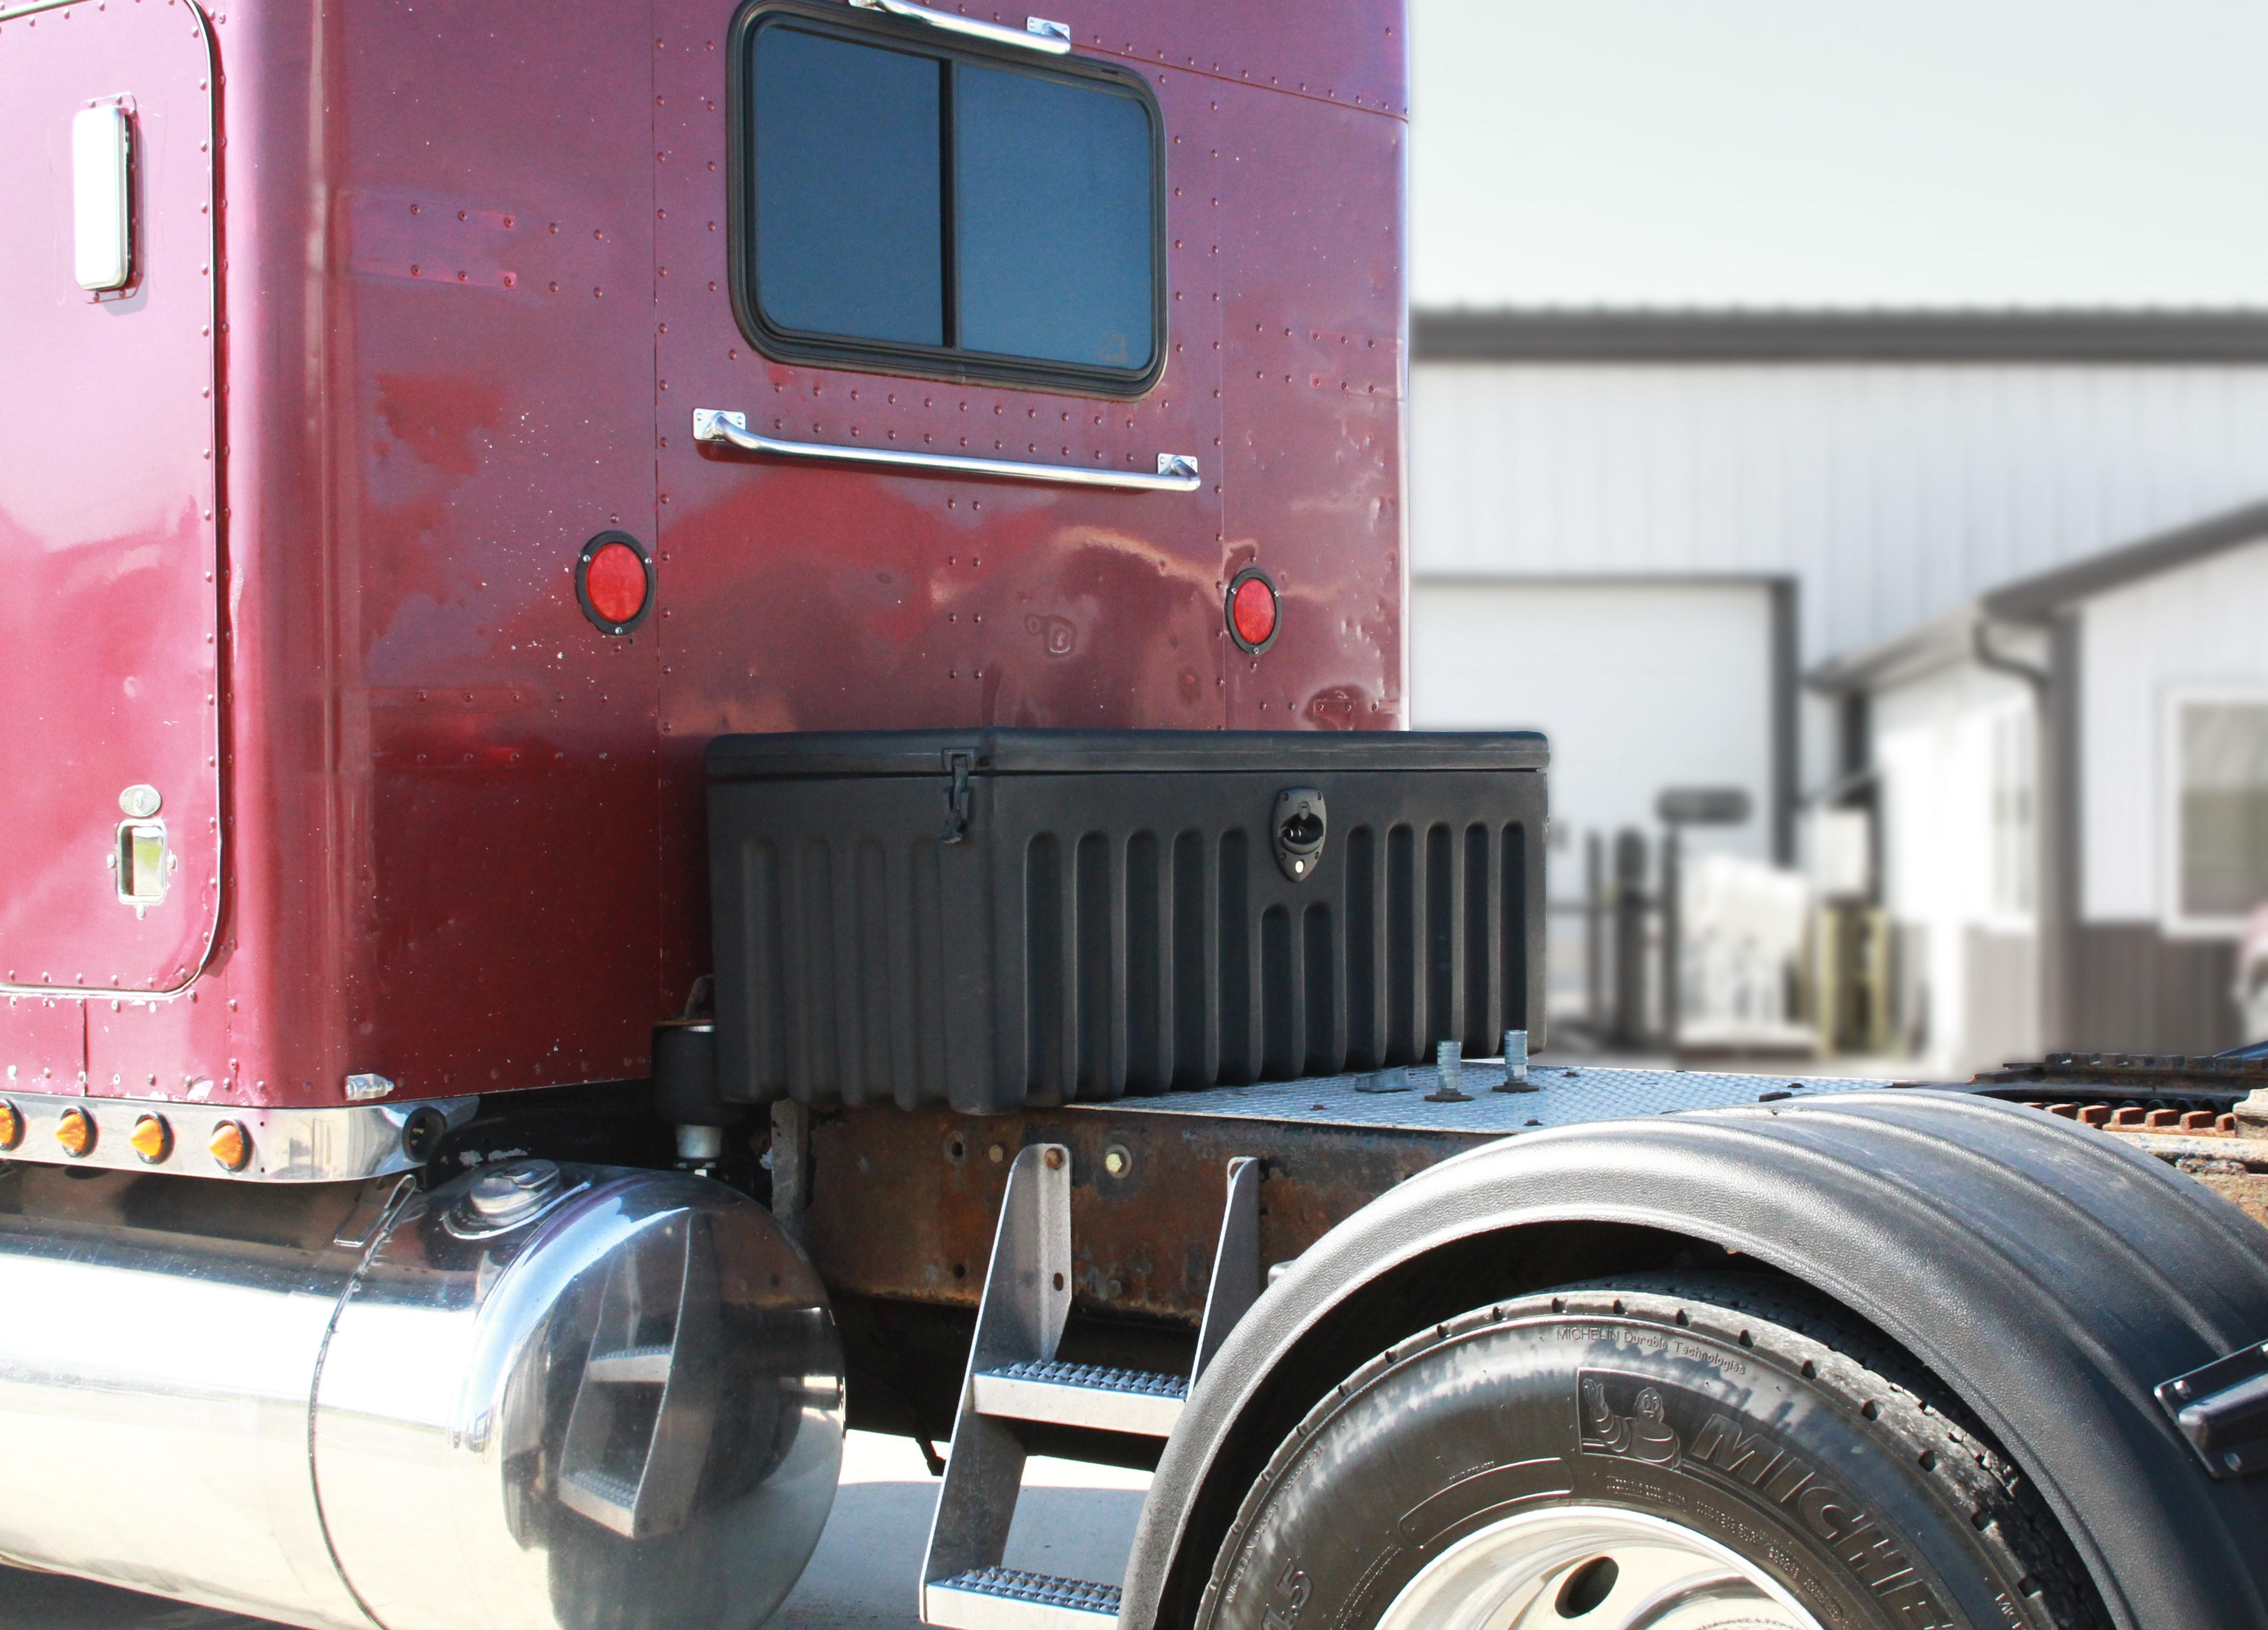 Minimizer Adds Larger Tool Box to Lineup